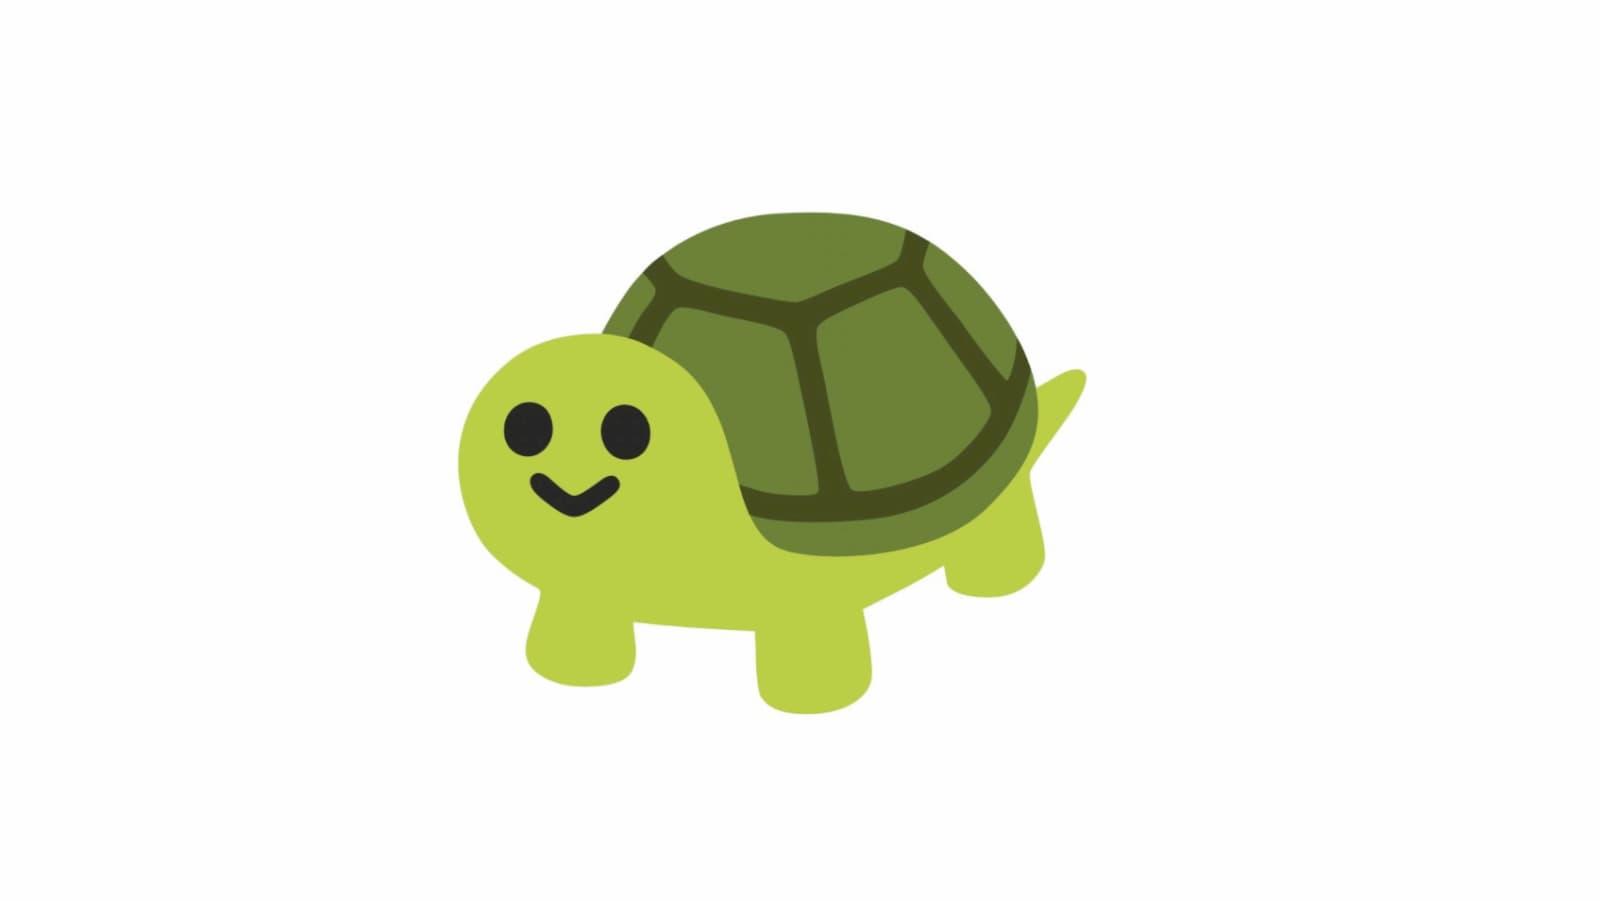 Emoji de tartaruga